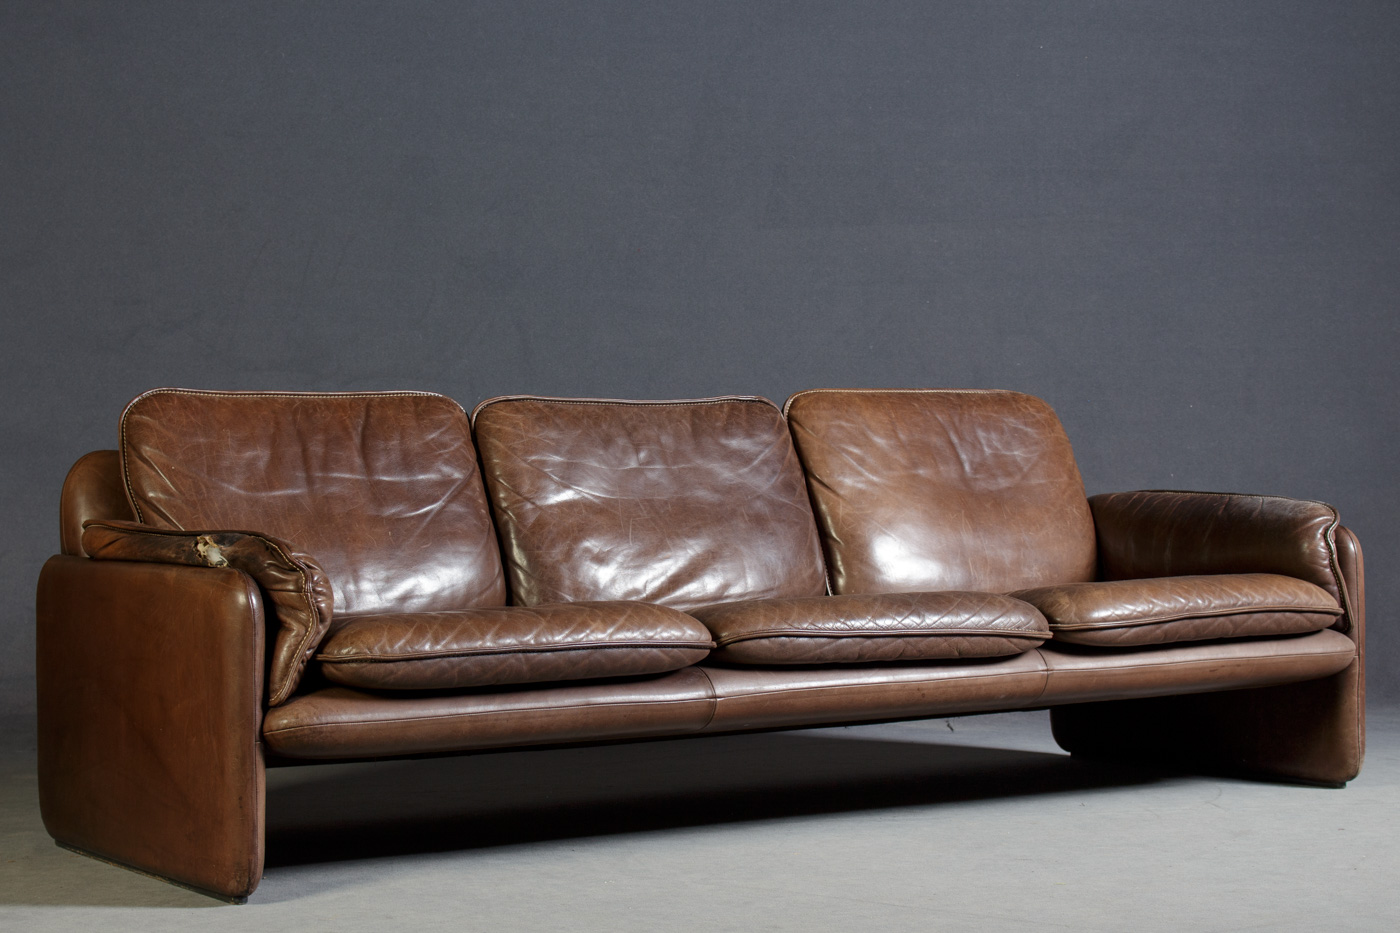 Dreier Sofa auktionstipset de sede dreier lounge sofa modell ds 61